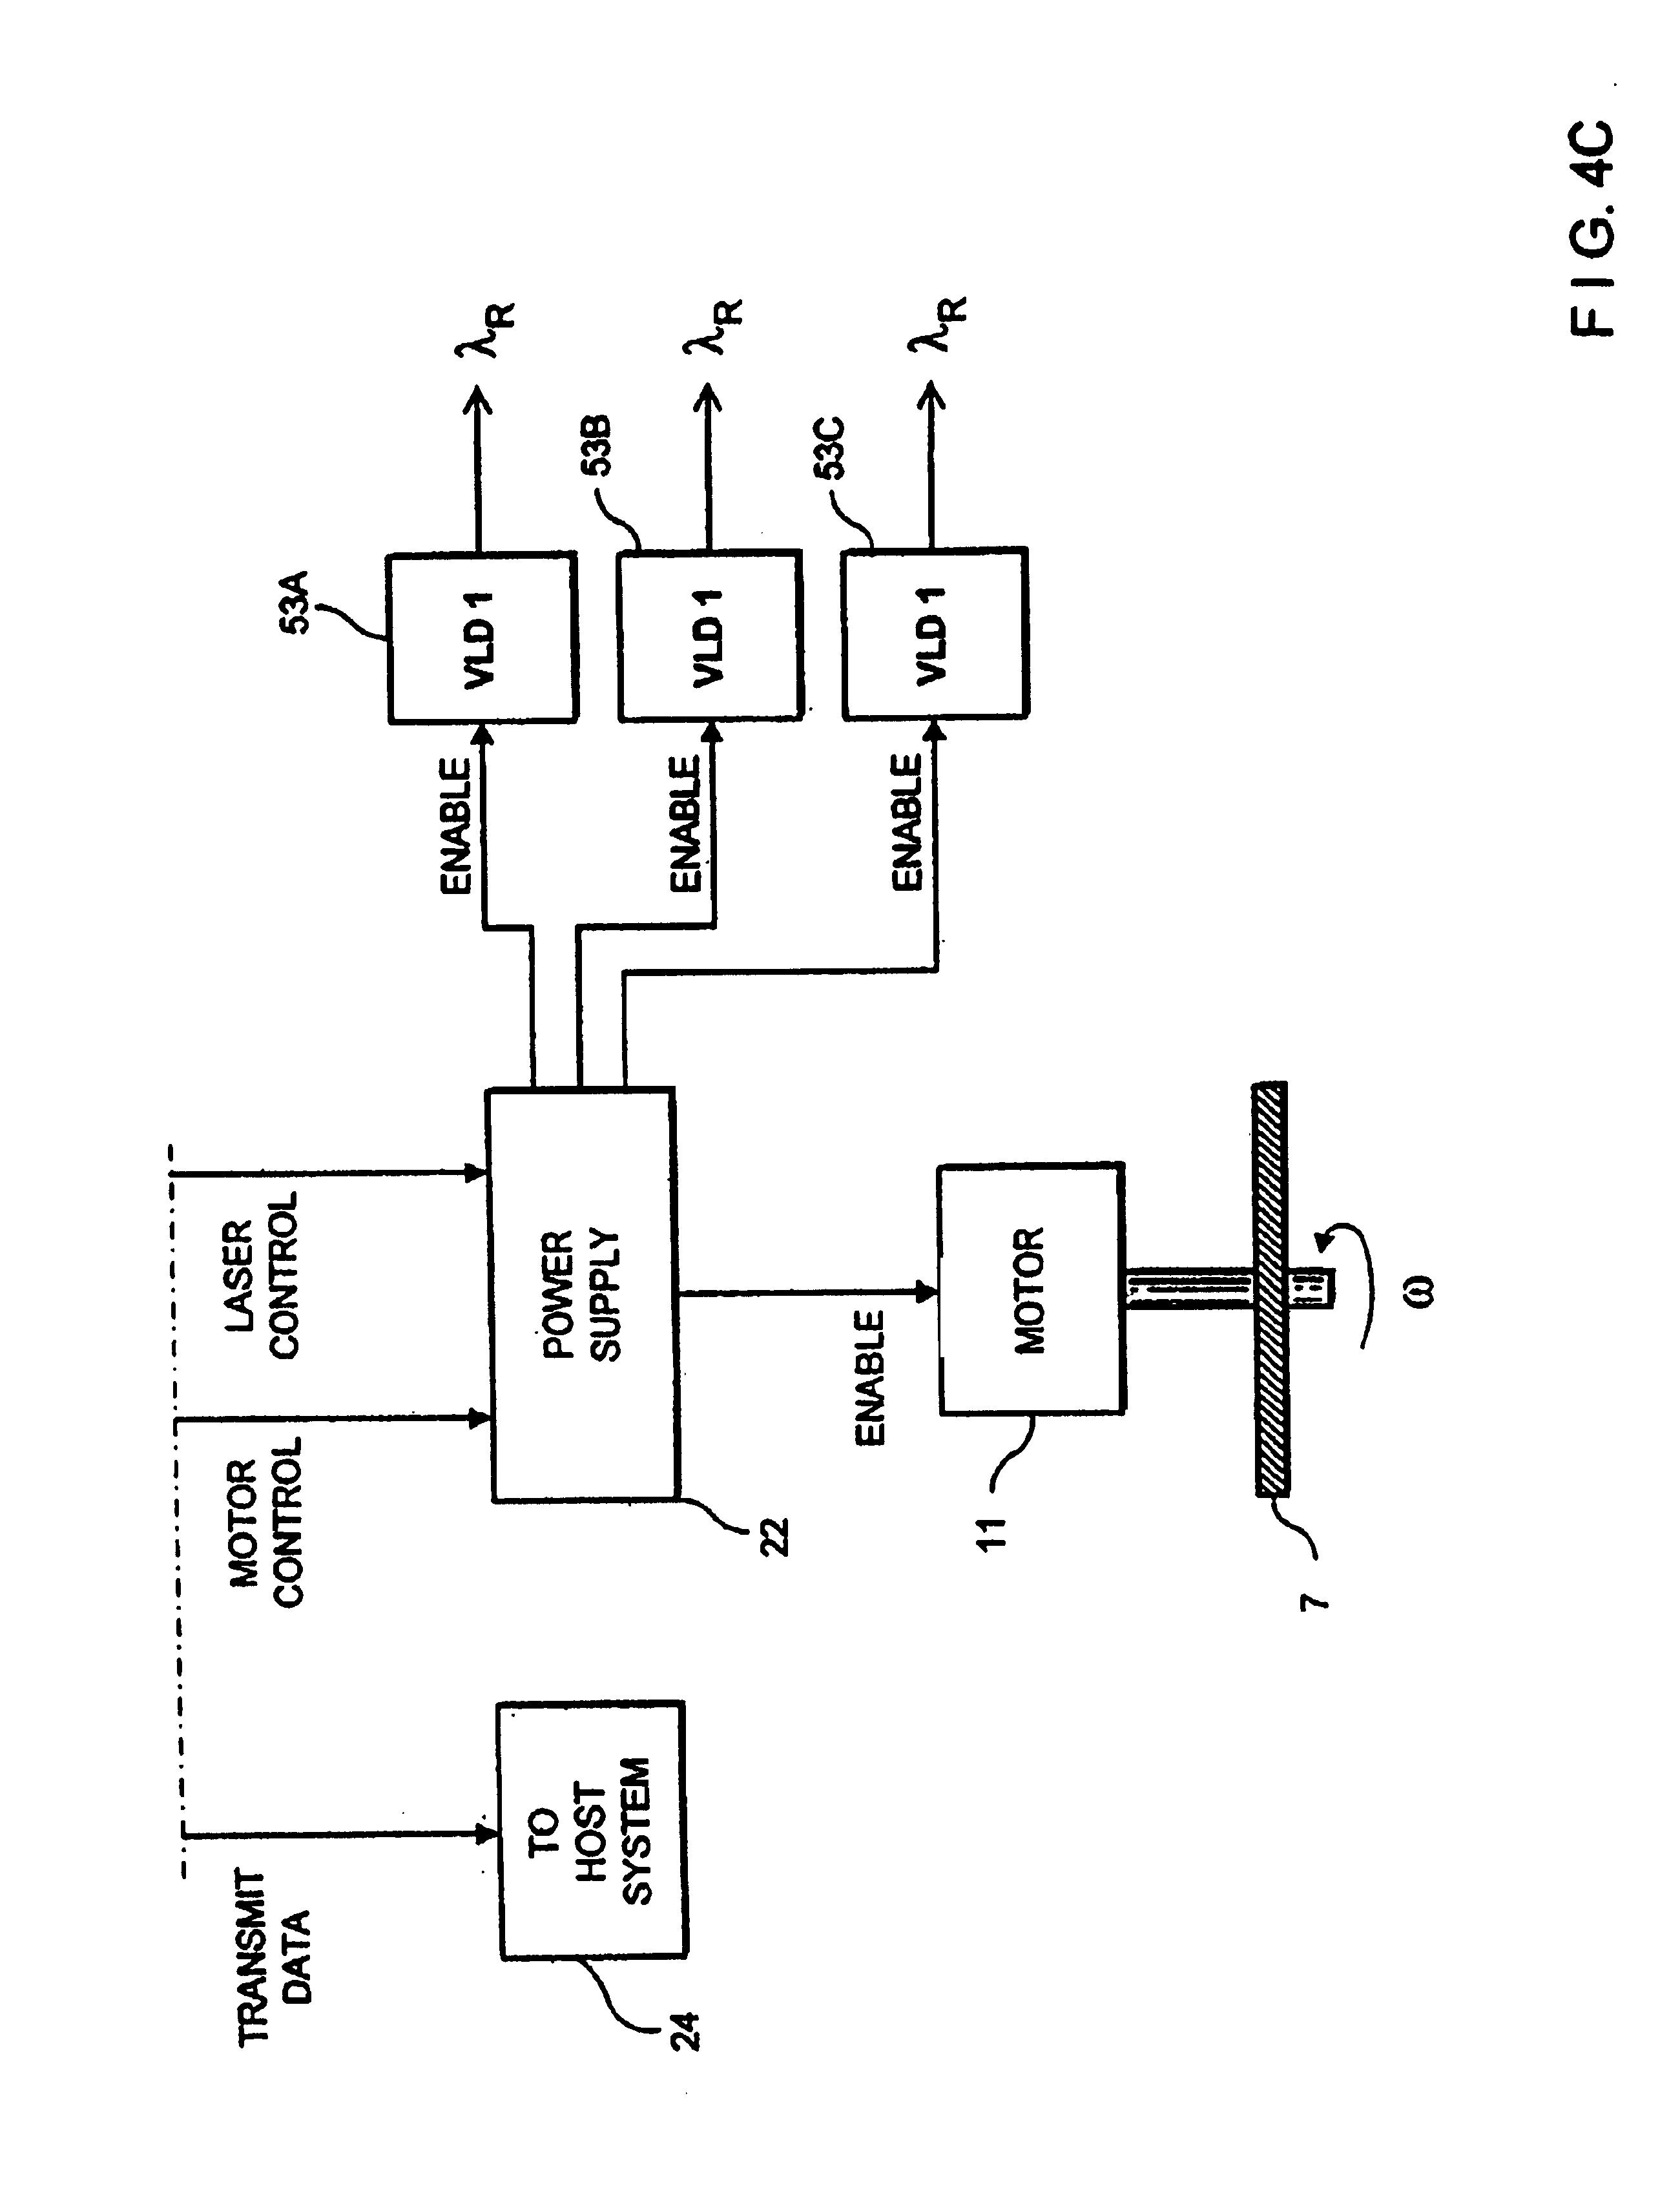 Patent Us 6953153 B2 Rc Car Circuit Finalstage